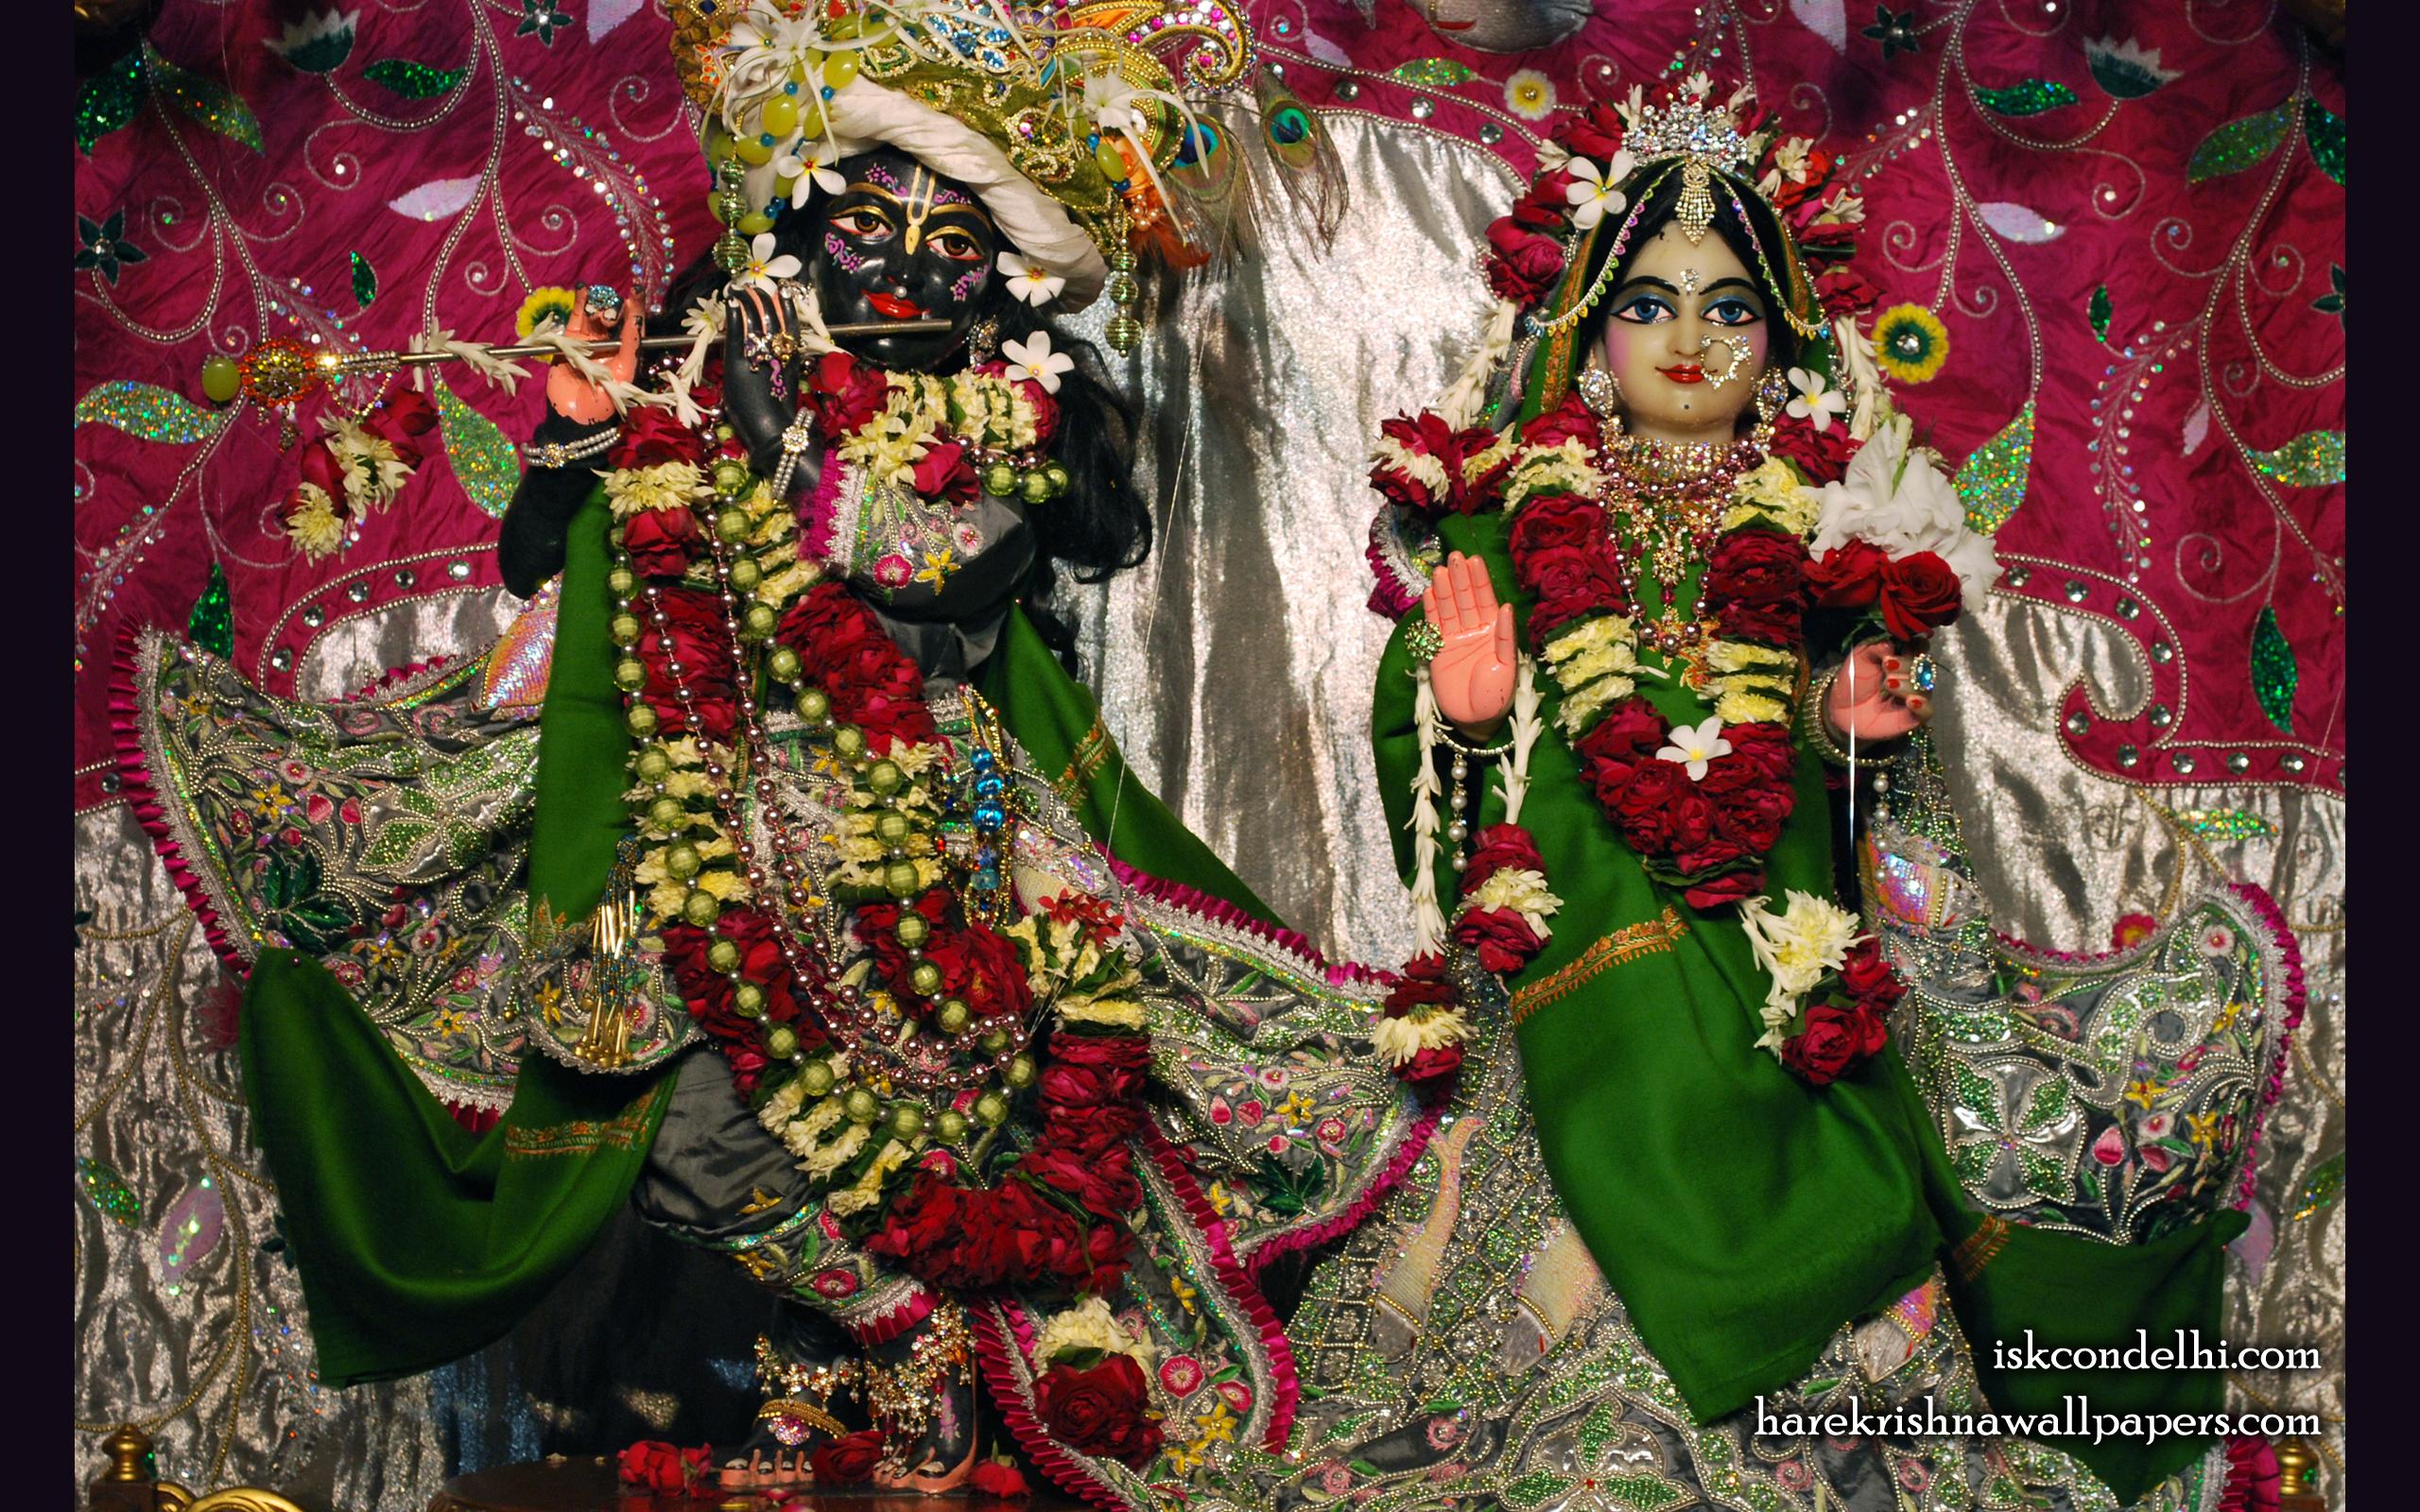 Sri Sri Radha Parthasarathi Wallpaper (006) Size 2560x1600 Download